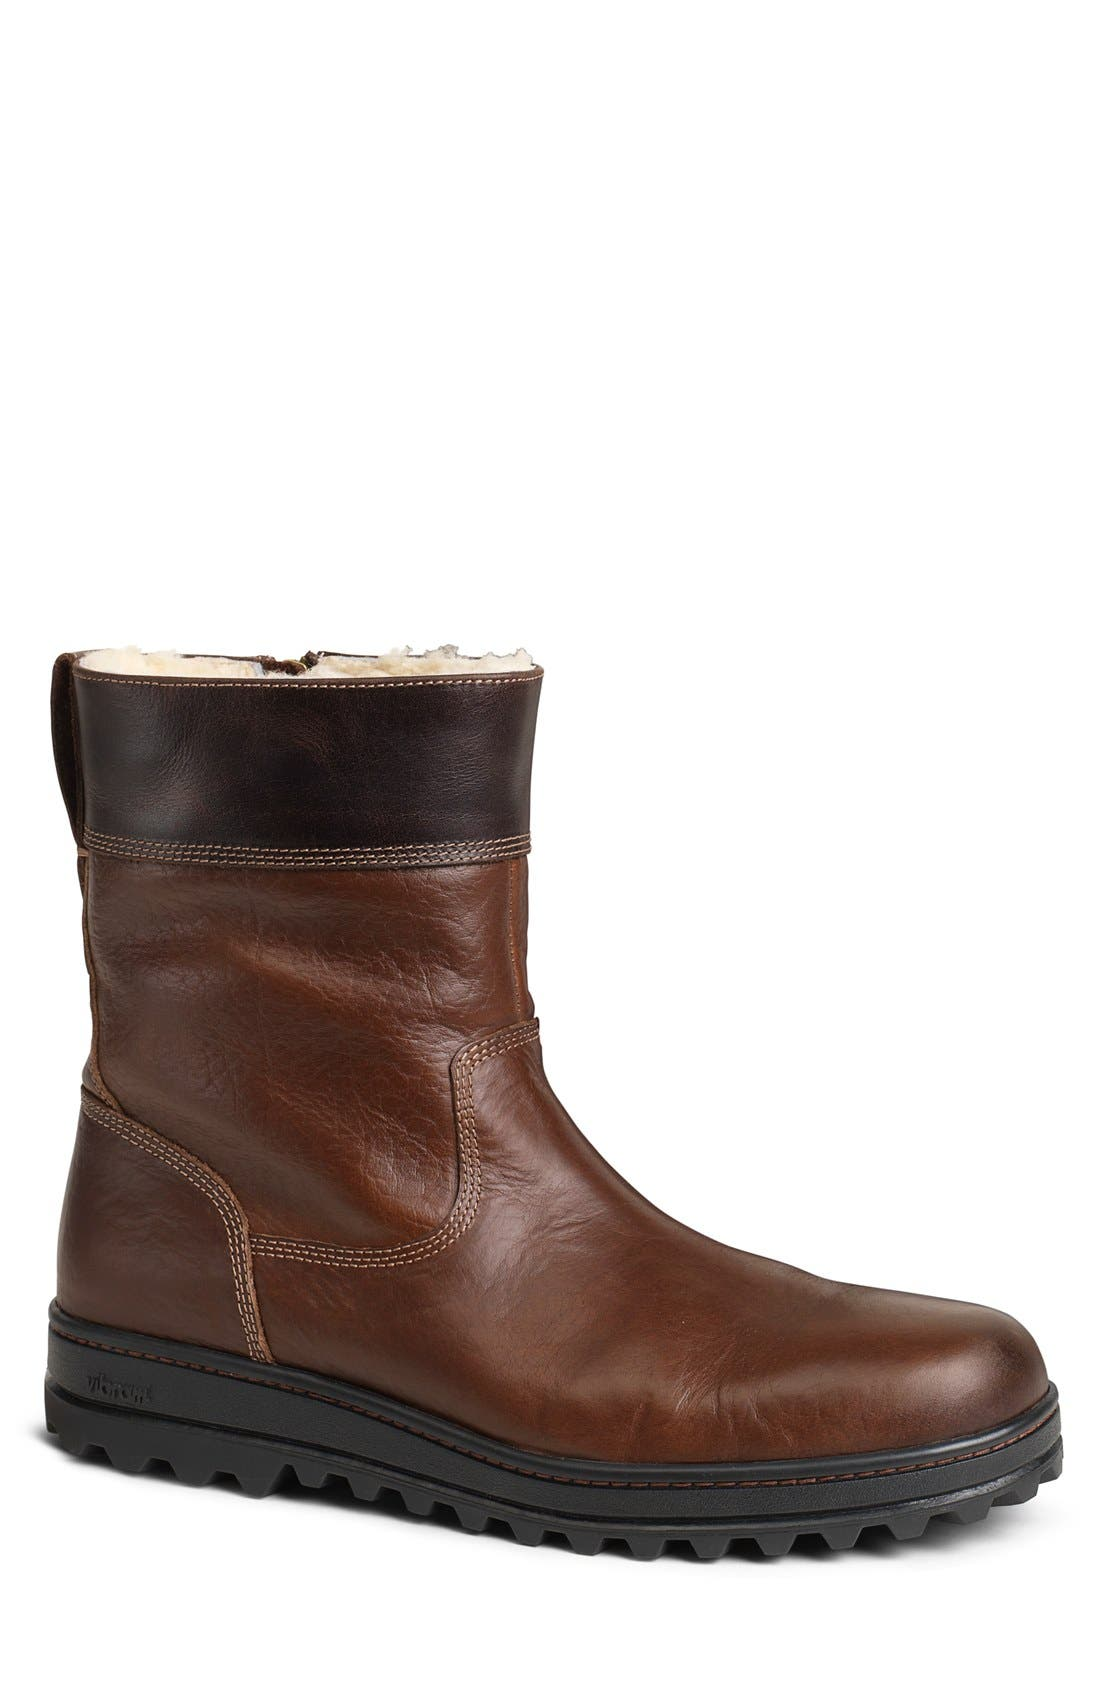 Trask 'Winslow' Plain Toe Boot (Men)